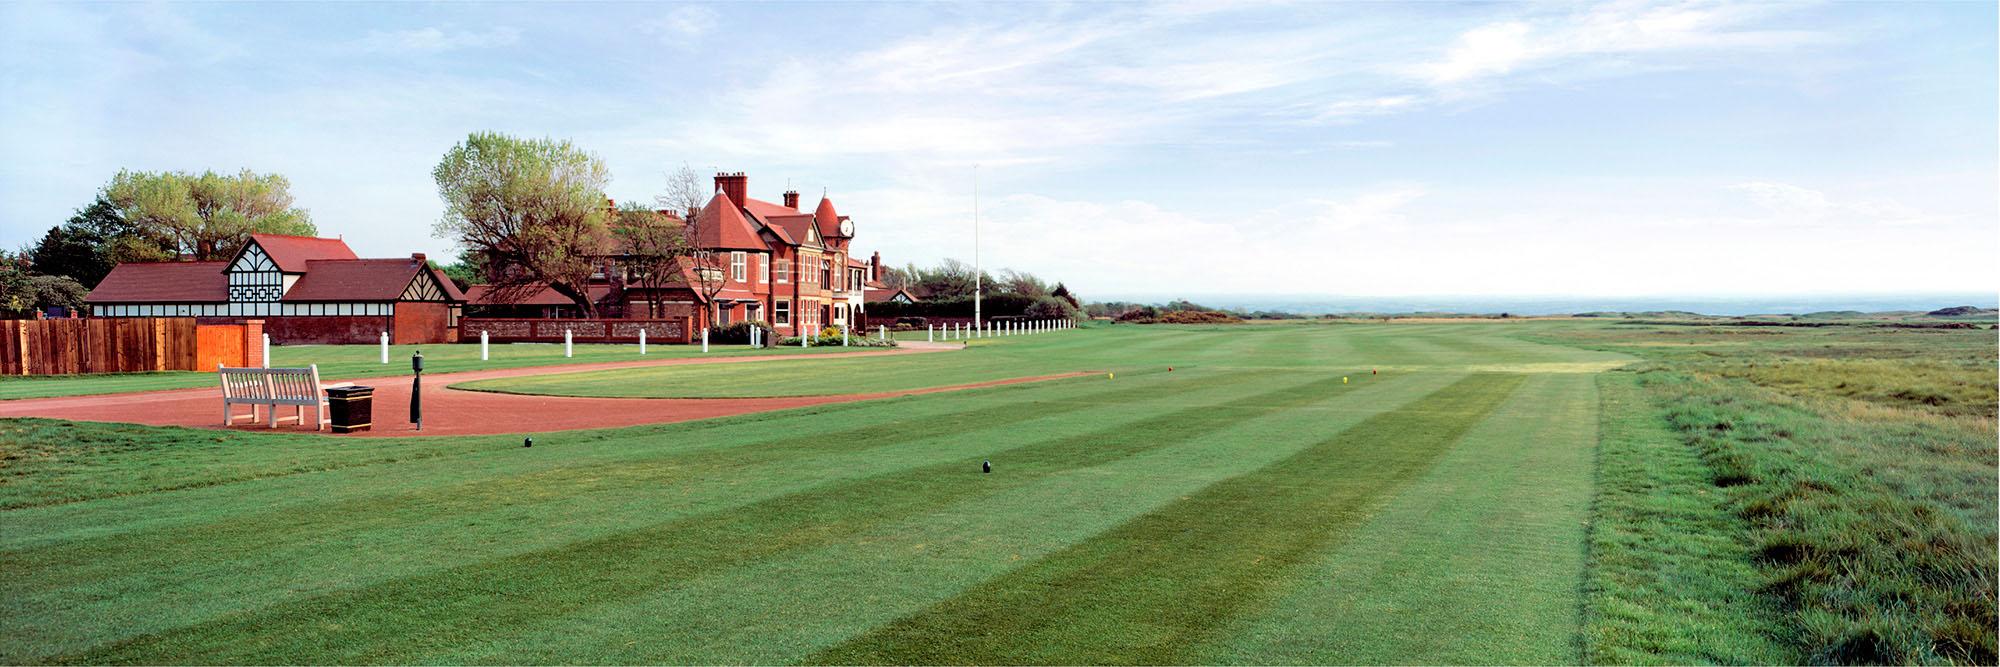 Golf Course Image - Royal Liverpool No. 1